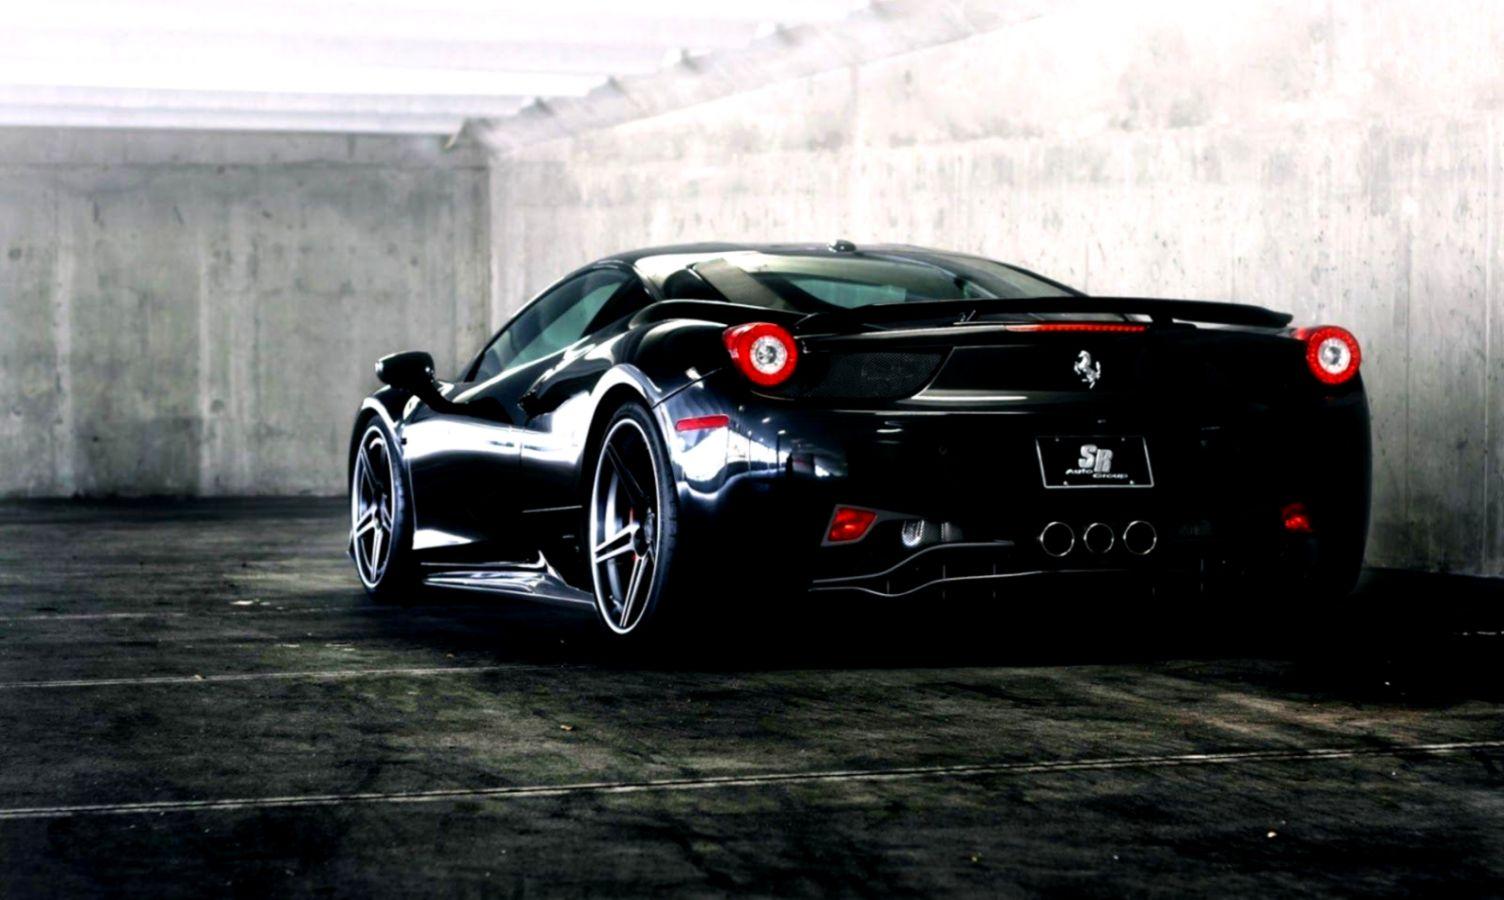 Ferrari 458 Italia Wallpaper Black 1080P | Smart Wallpapers